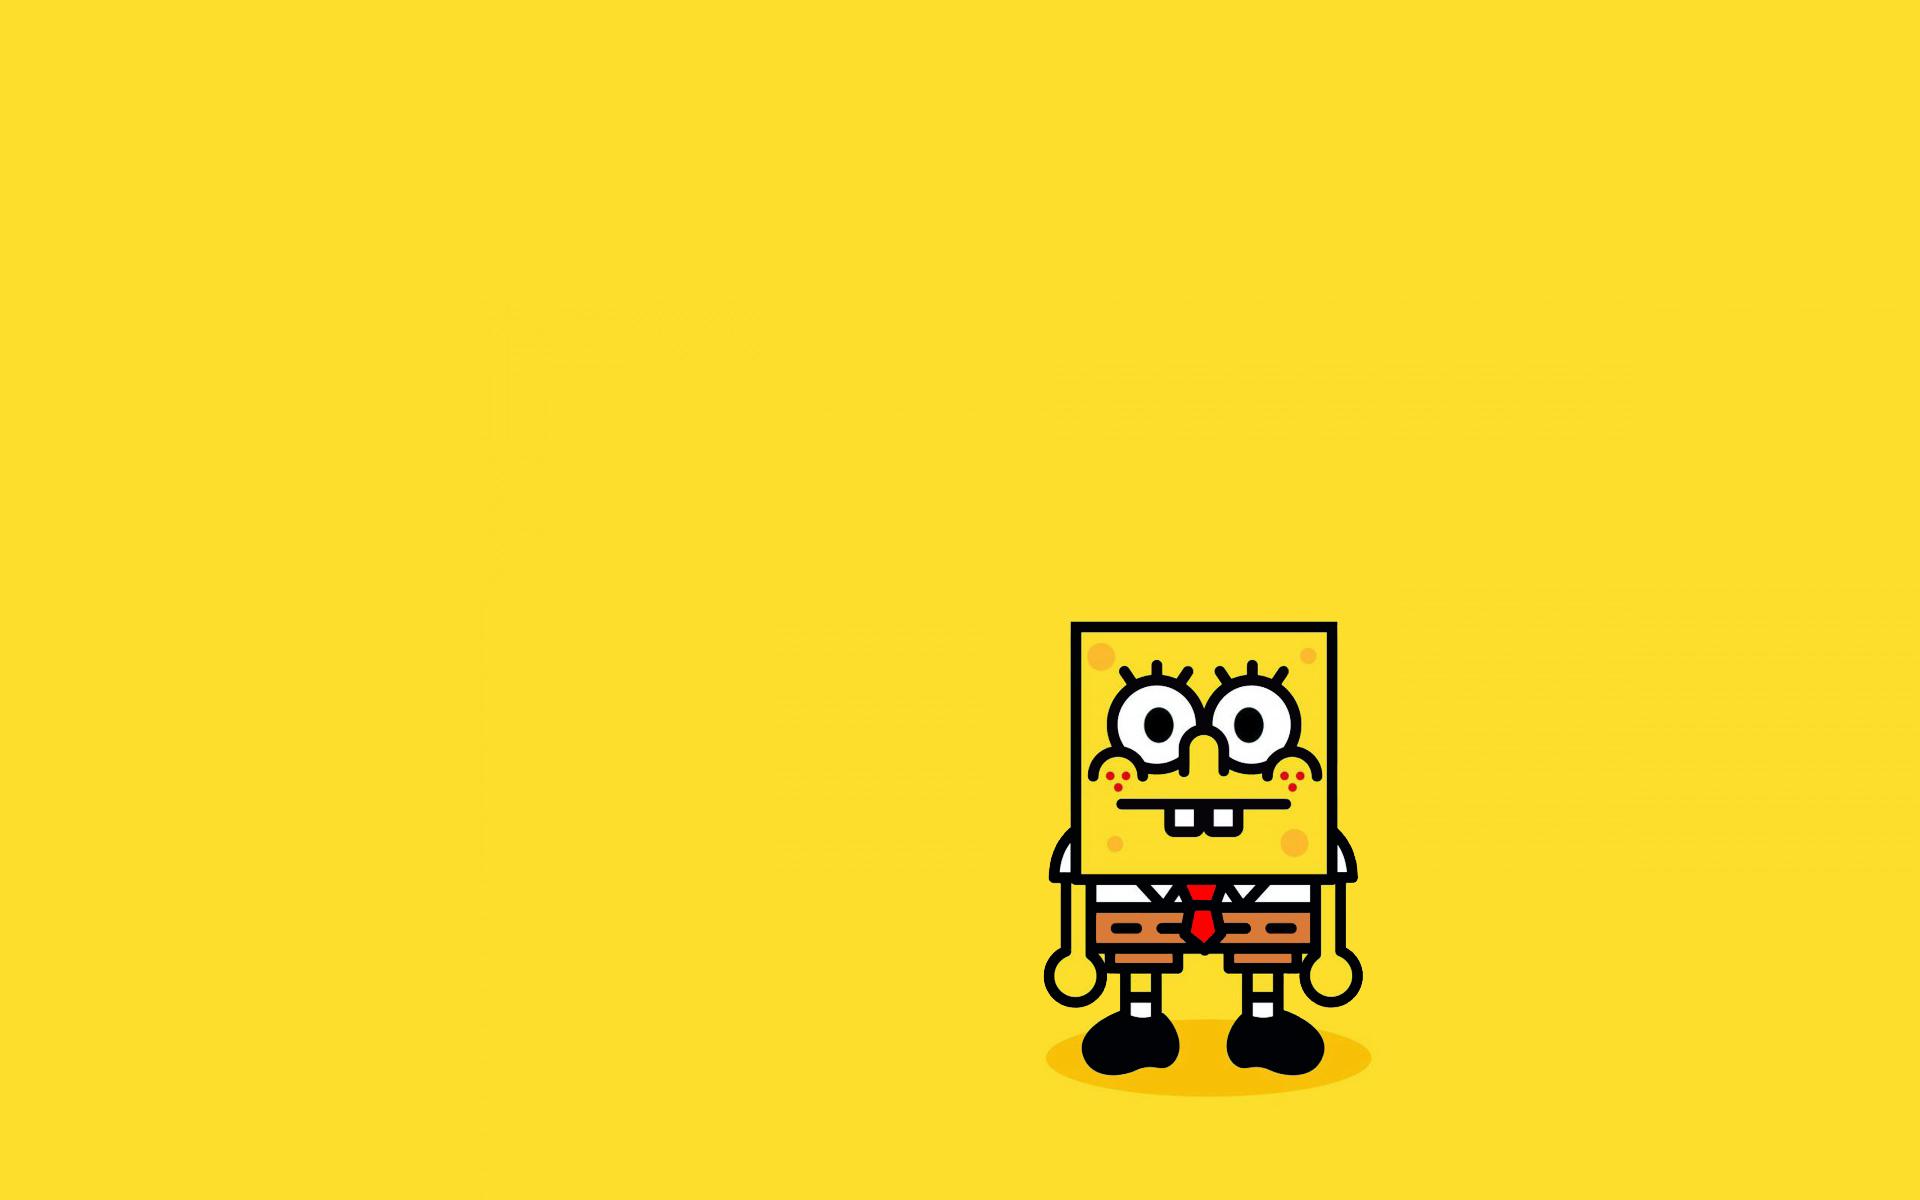 Spongebob Minimalism Hd Cartoons 4k Wallpapers Images